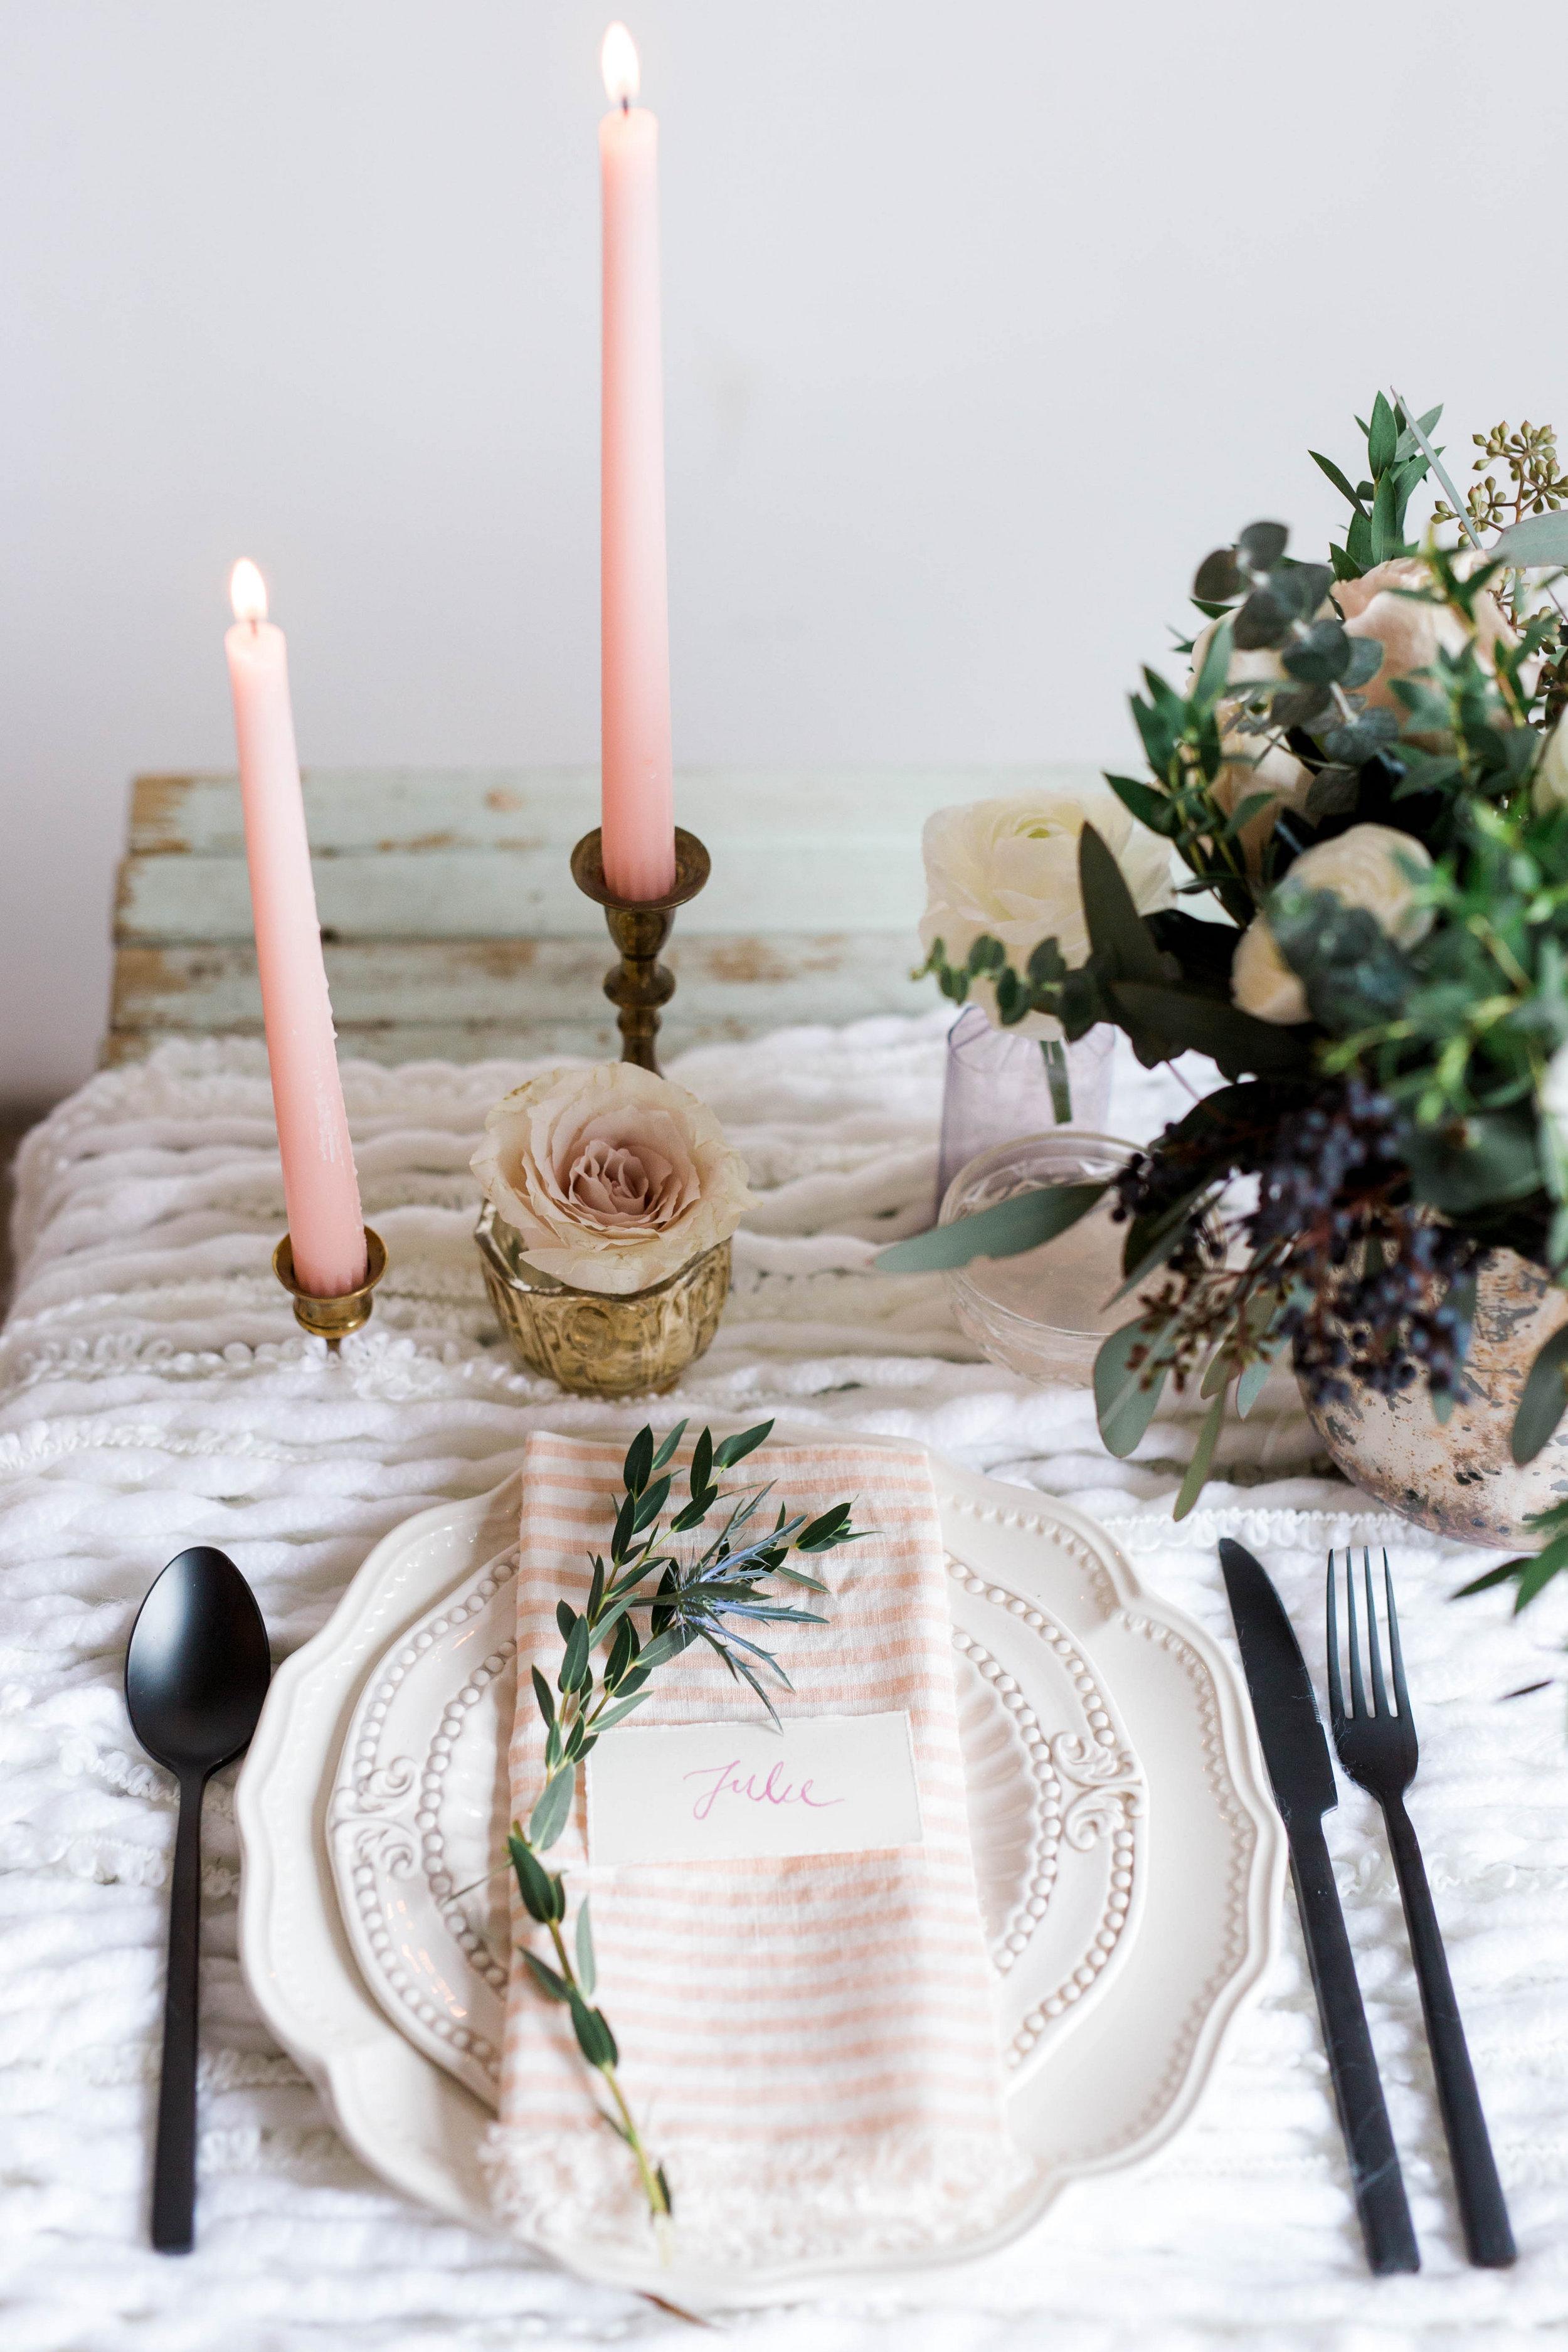 100 Layer Cake:Marie Antoinette Inspired Wedding Inspiration. Click for more.